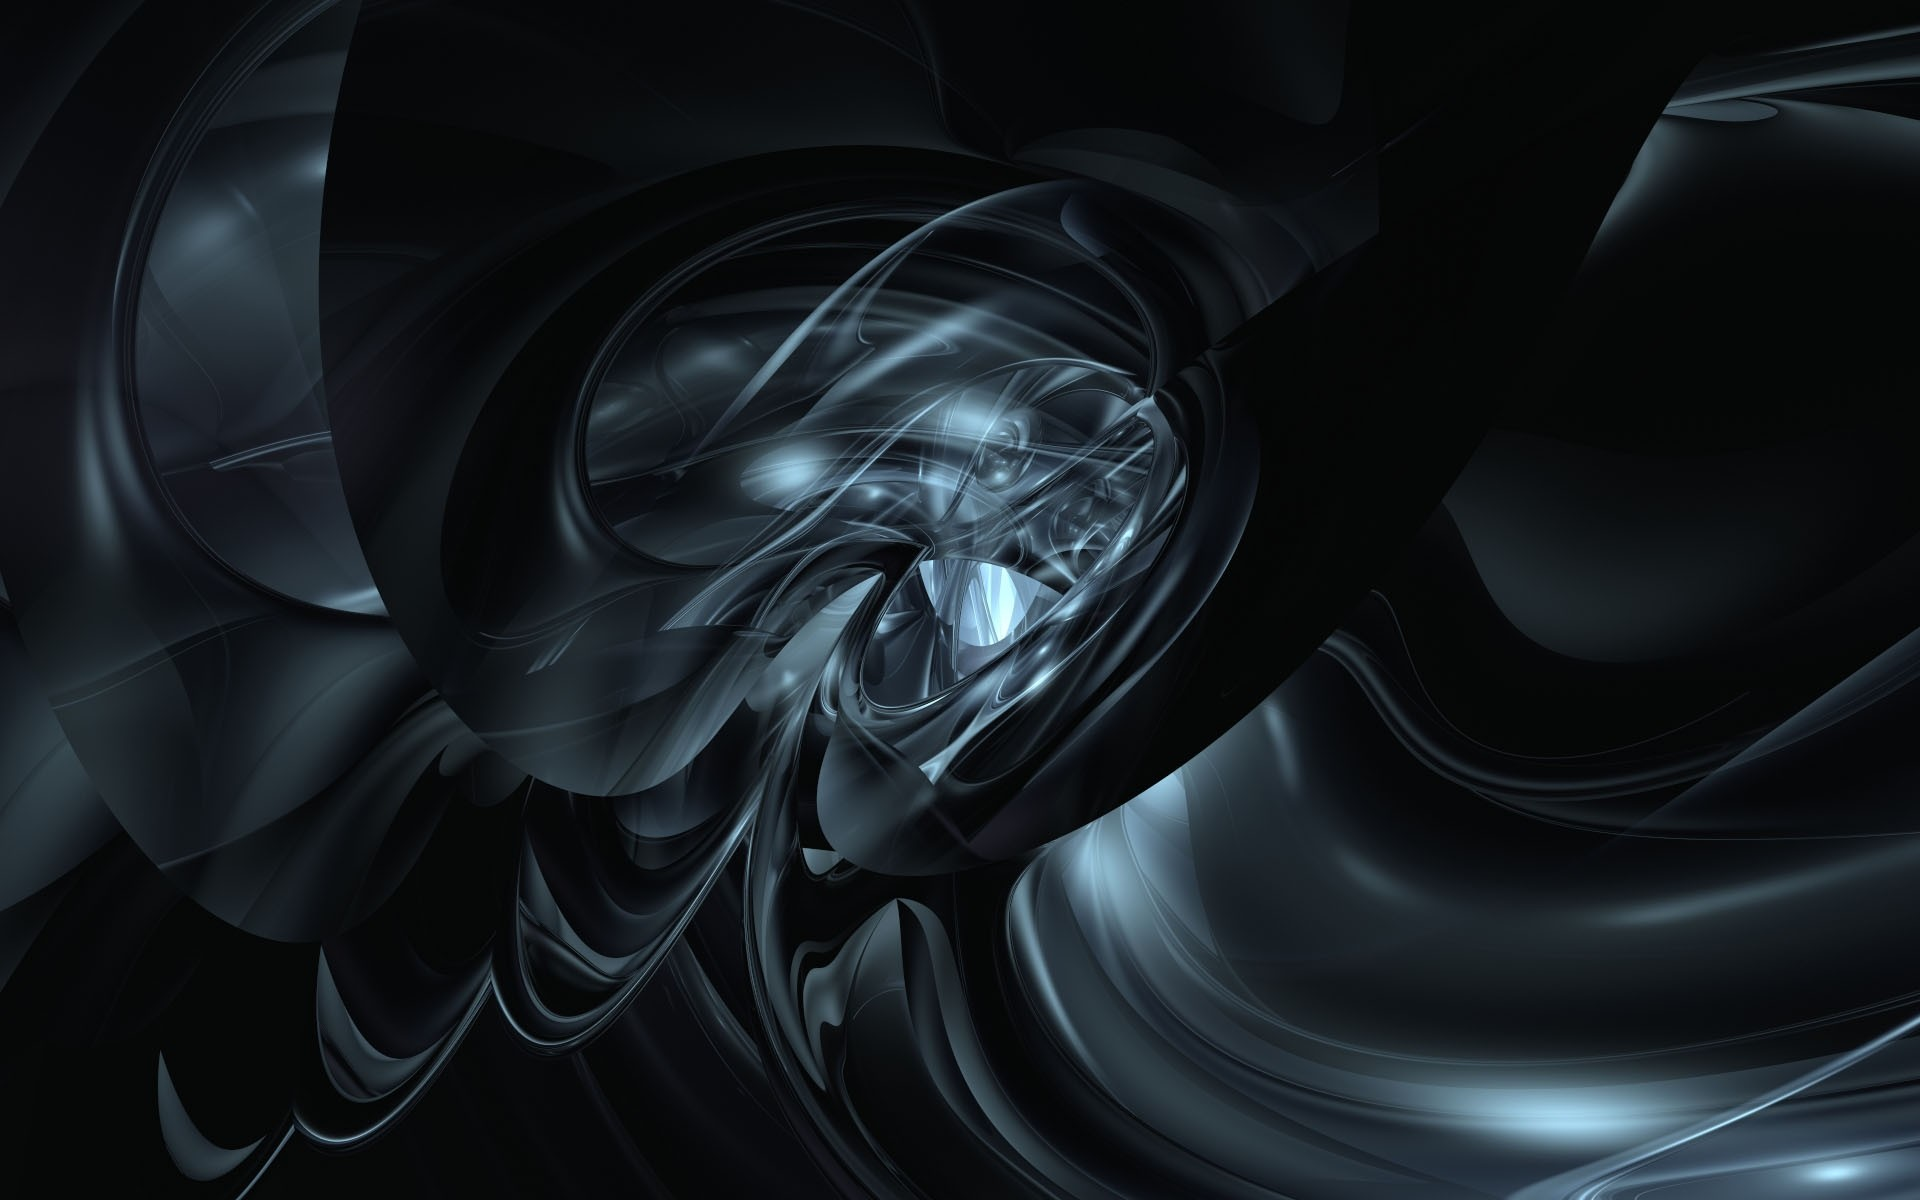 Res: 1920x1200, Dark Abstract Wallpaper 47839